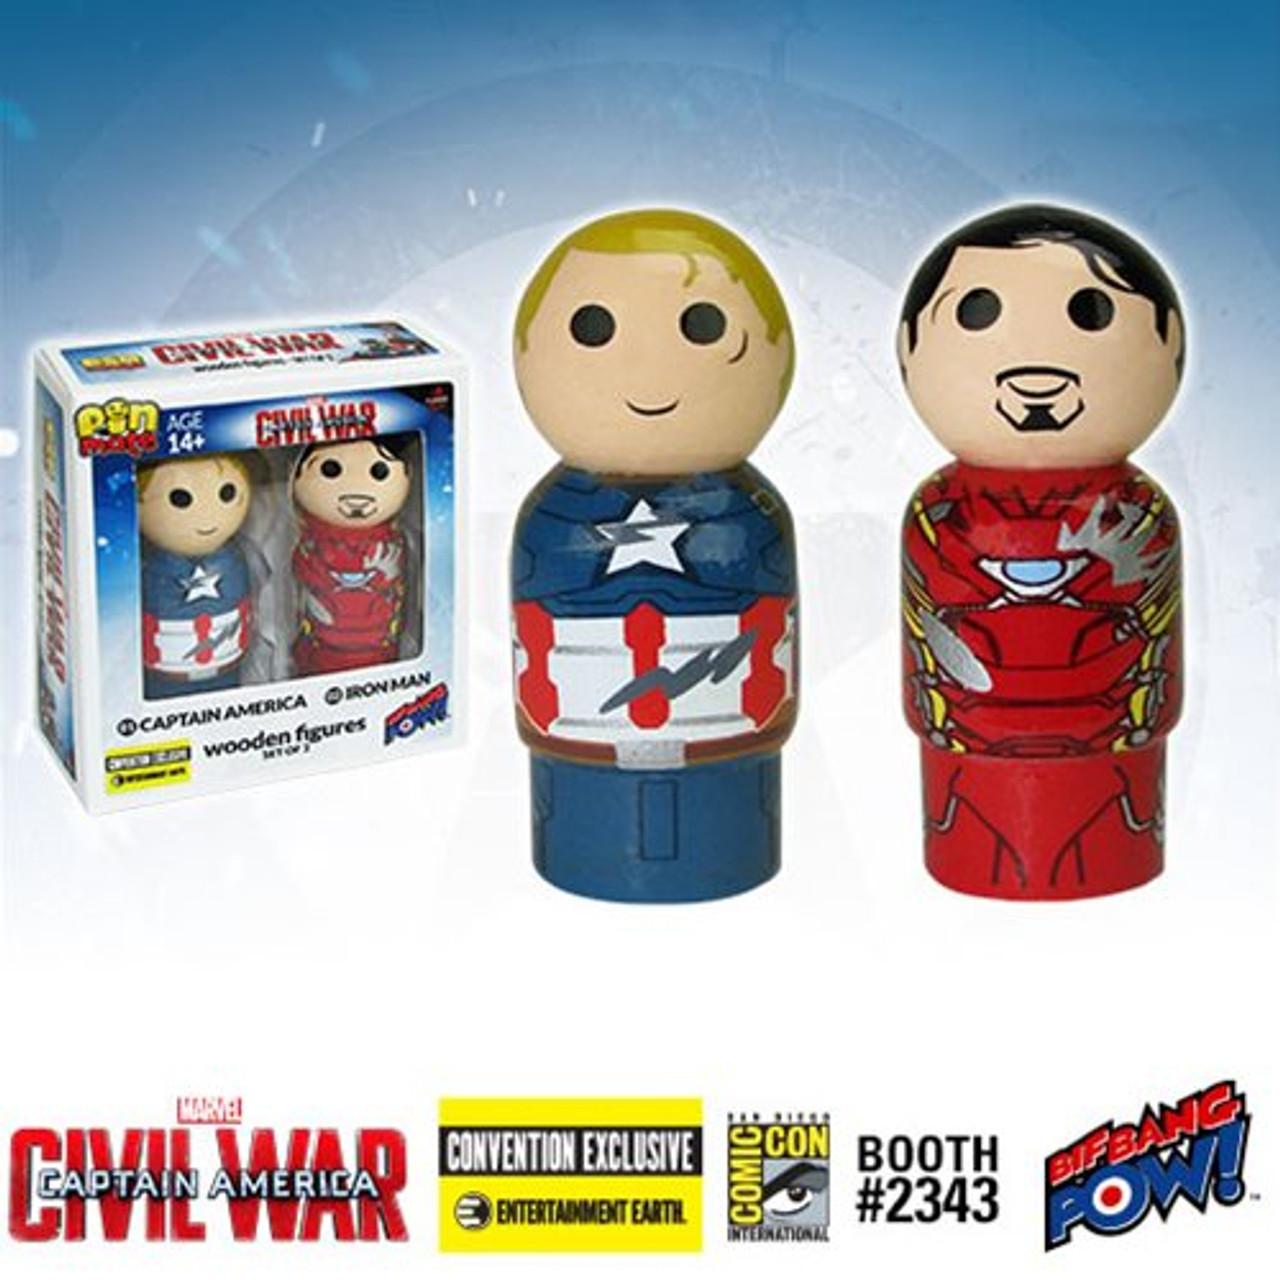 Captain America Pin Mate Wooden Figure